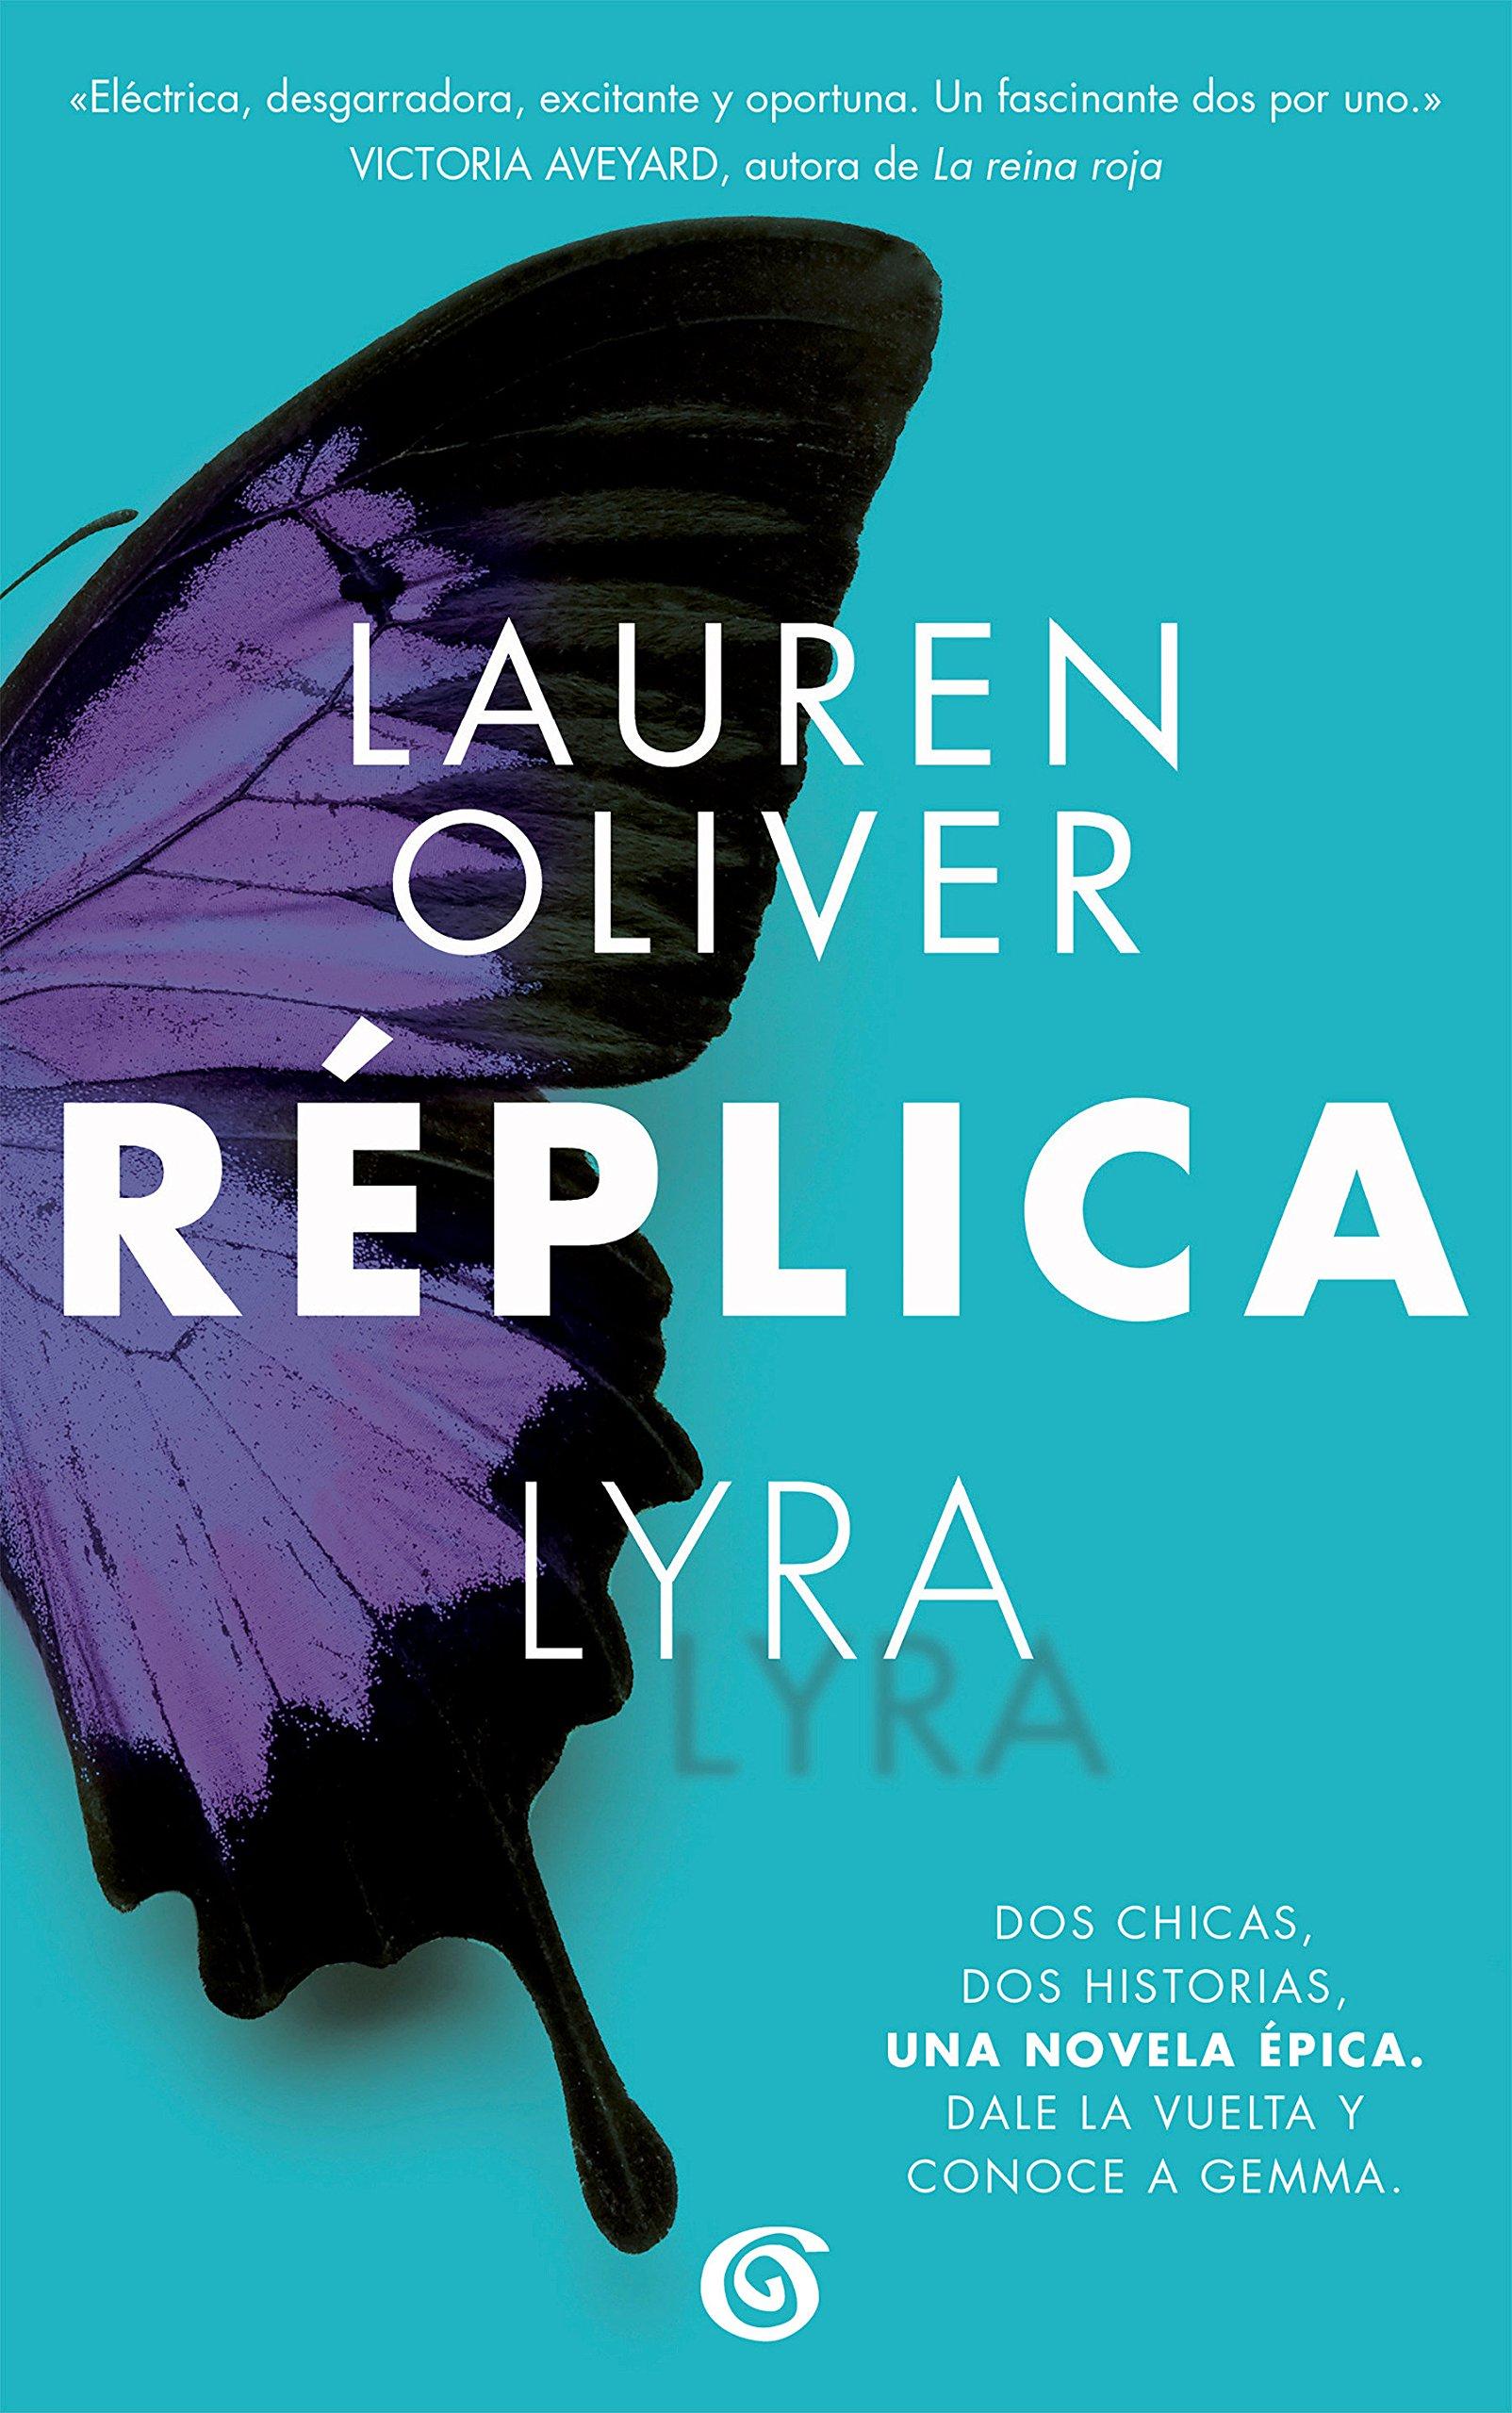 Réplica / Replica (Spanish Edition) (Spanish) Paperback – July 12, 2017